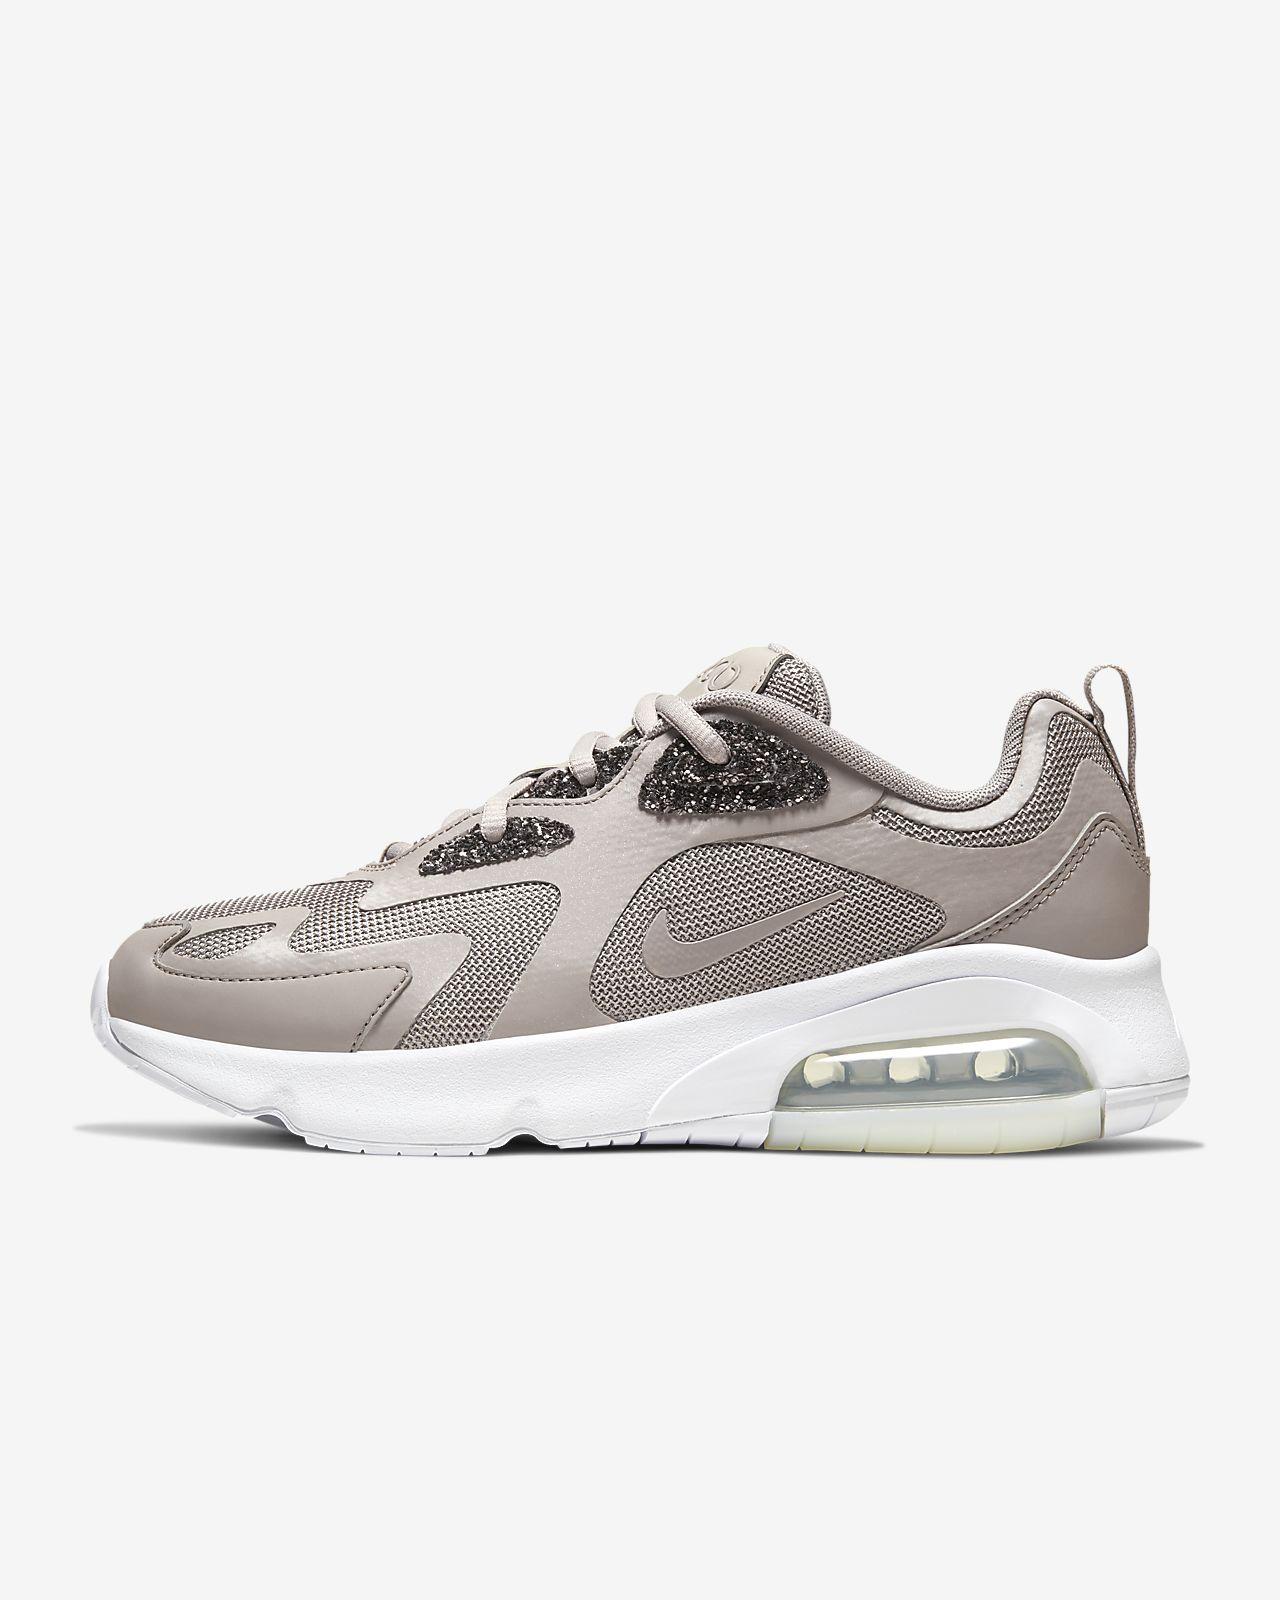 Nike Air Max 200 Women's Glitter Shoe